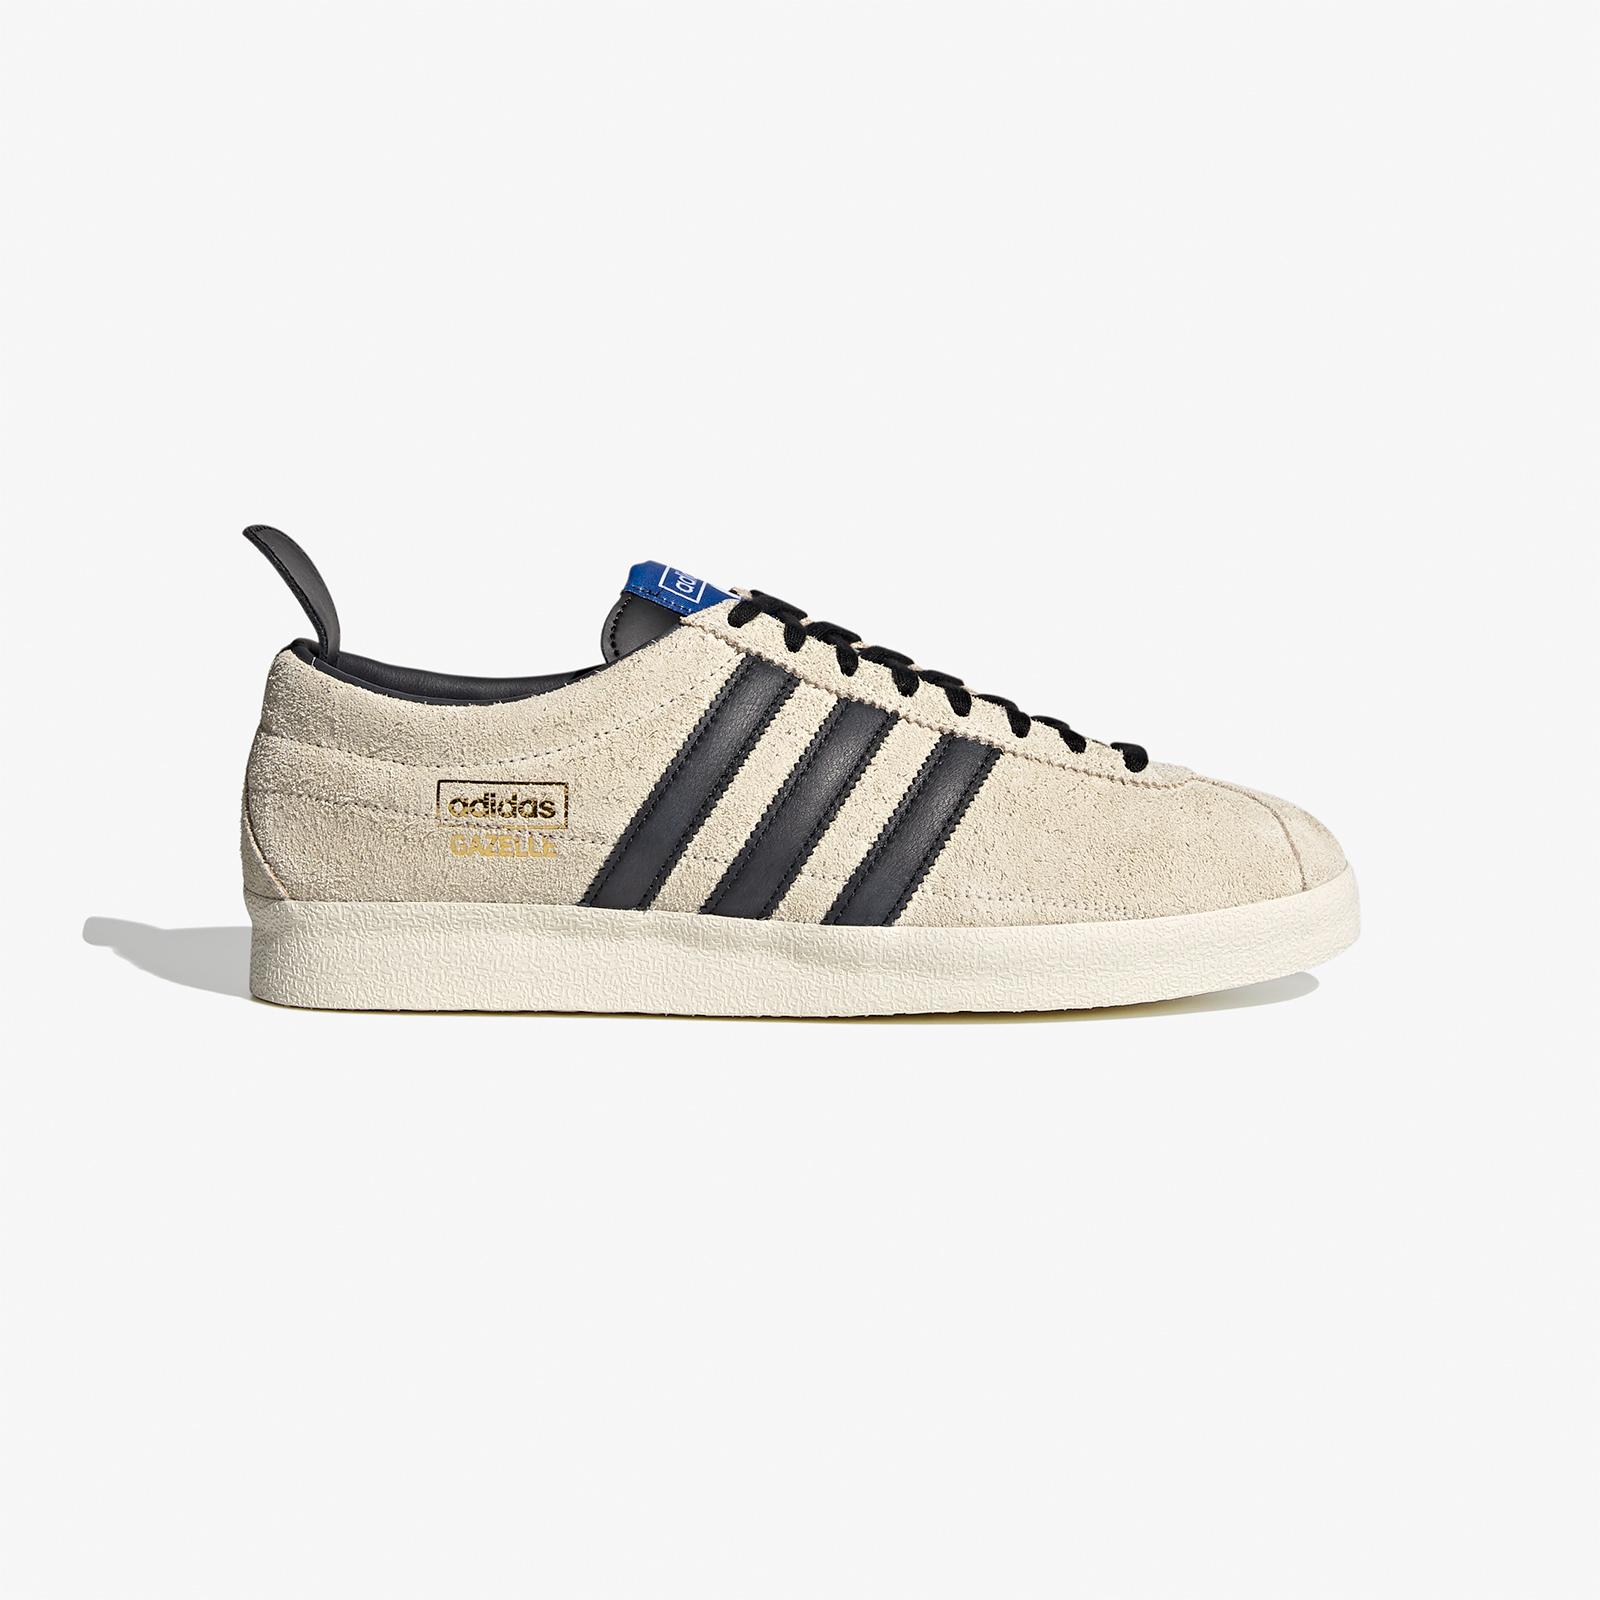 adidas Gazelle Vintage - Fx5488 - SNS   sneakers & streetwear ...